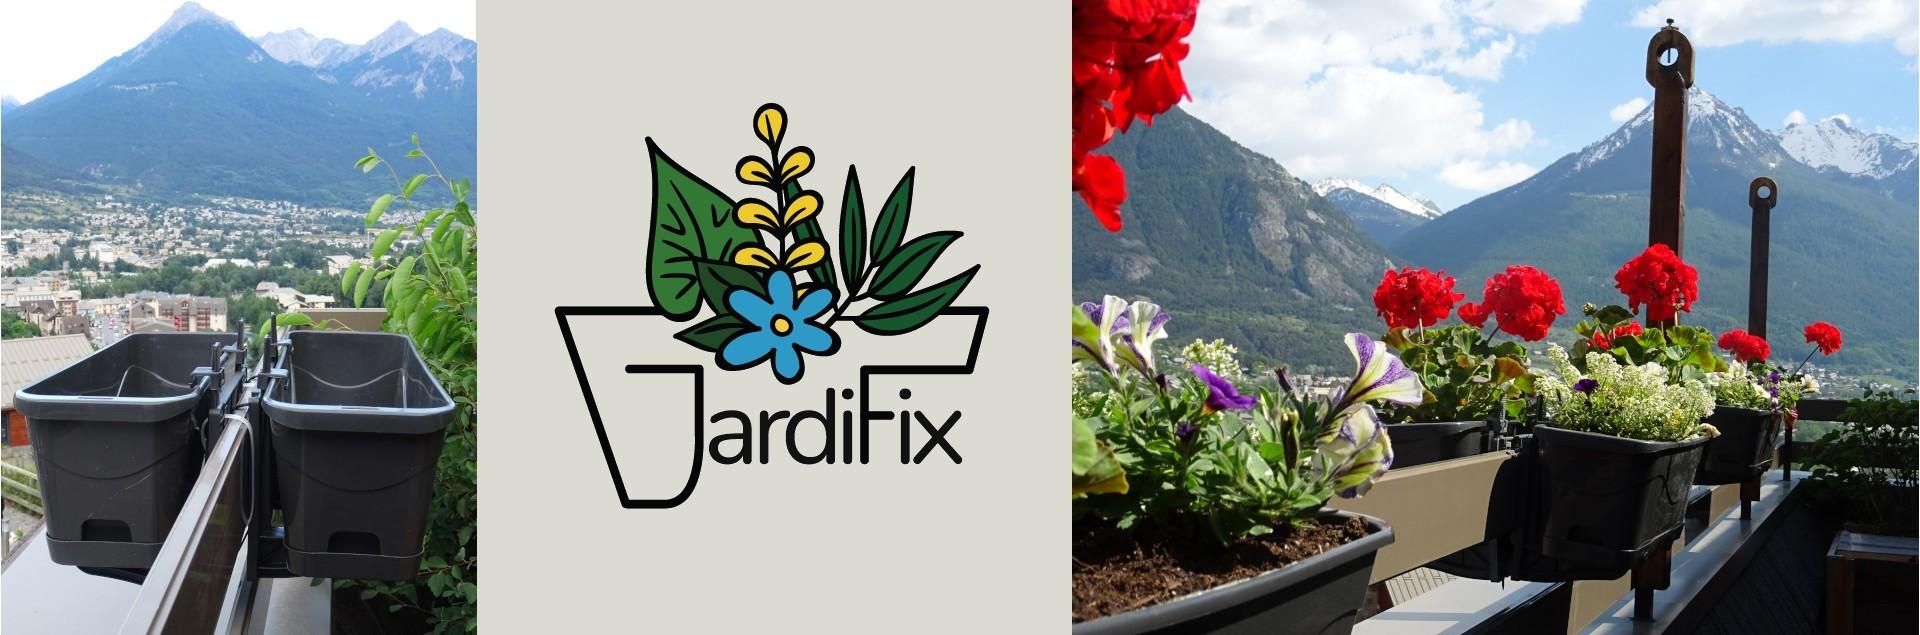 http://www.babazinov.fr/en/gardening/43-jardifix-3415350000179.html